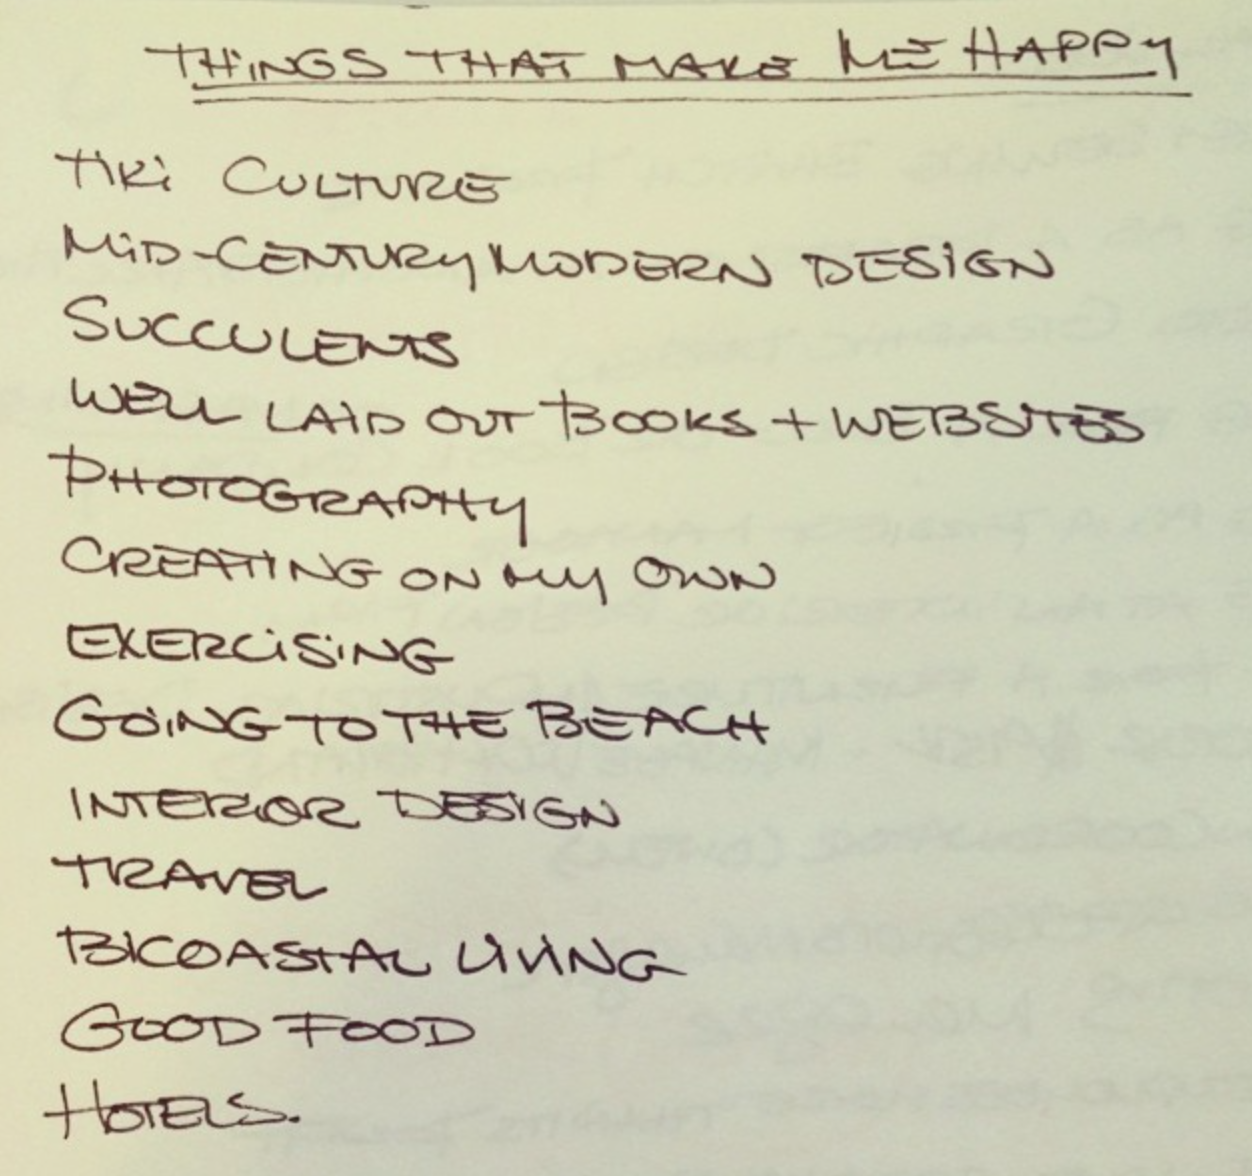 things-that-make-me-happy.jpg